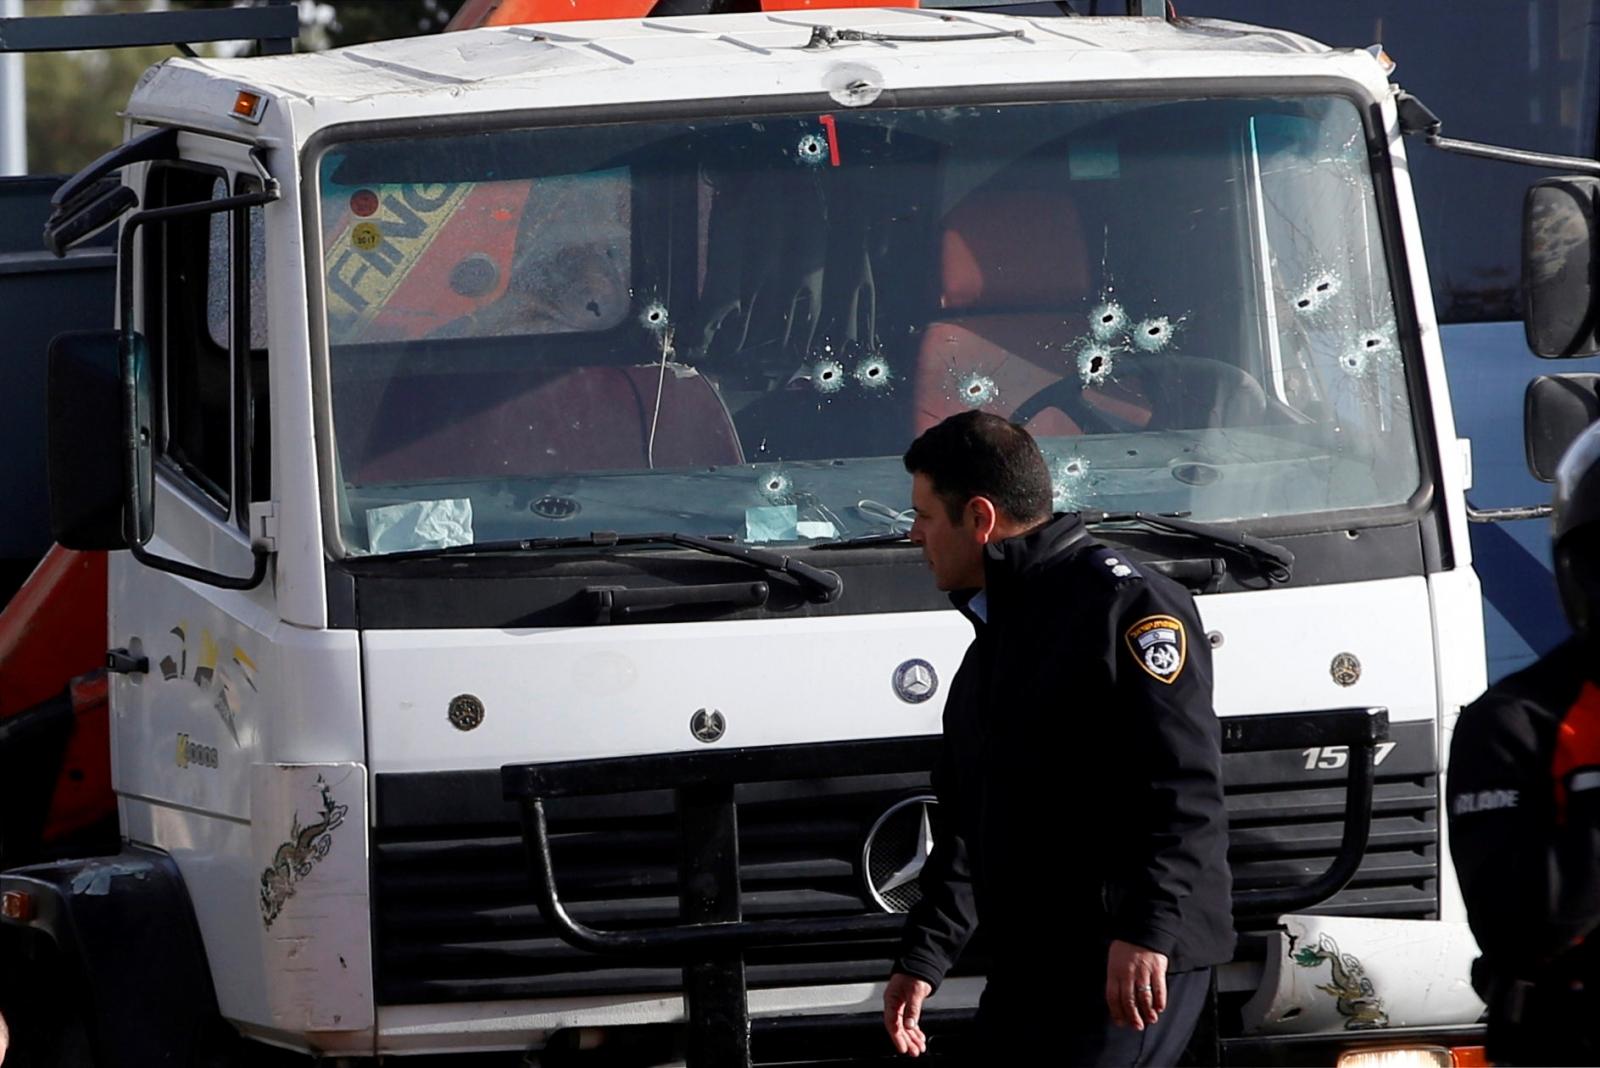 Truck-ramming incident in Jerusalem